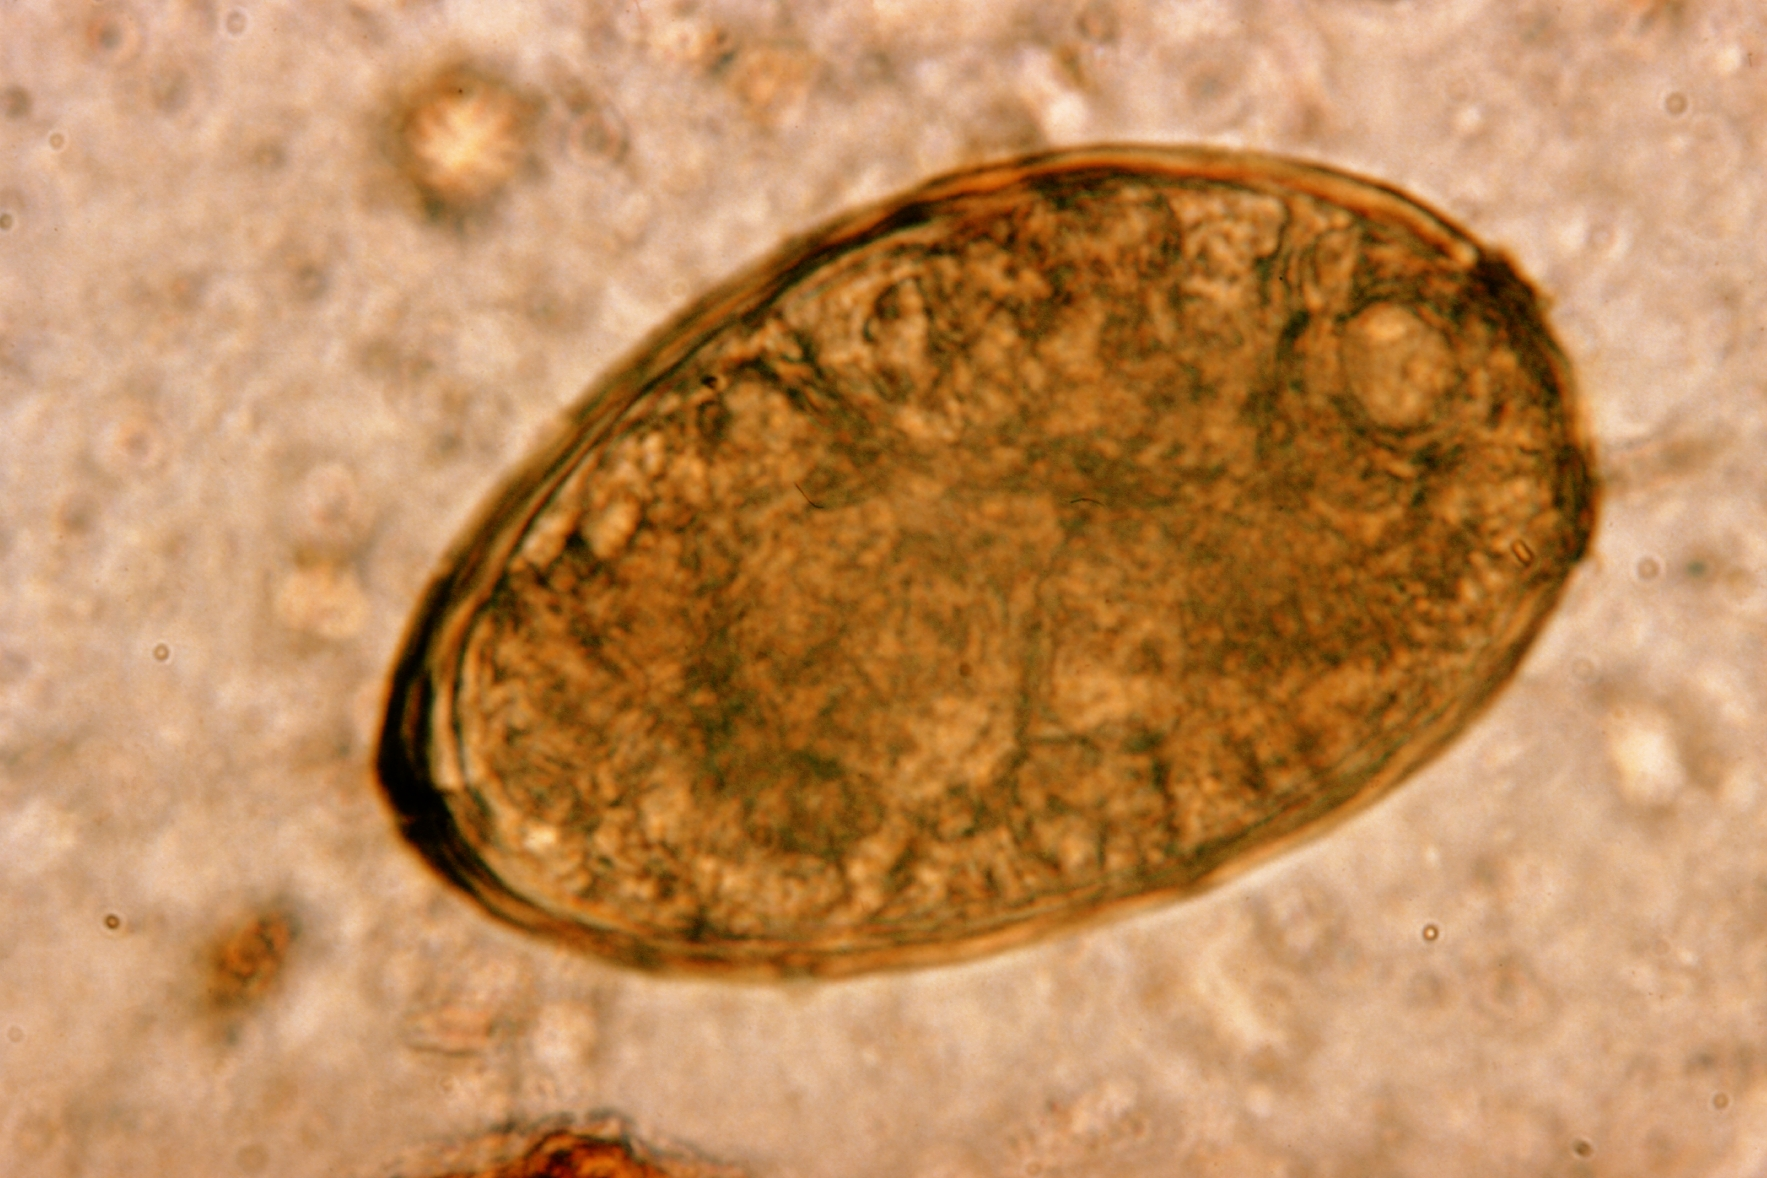 paragonimus kellicotti worm - photo #10